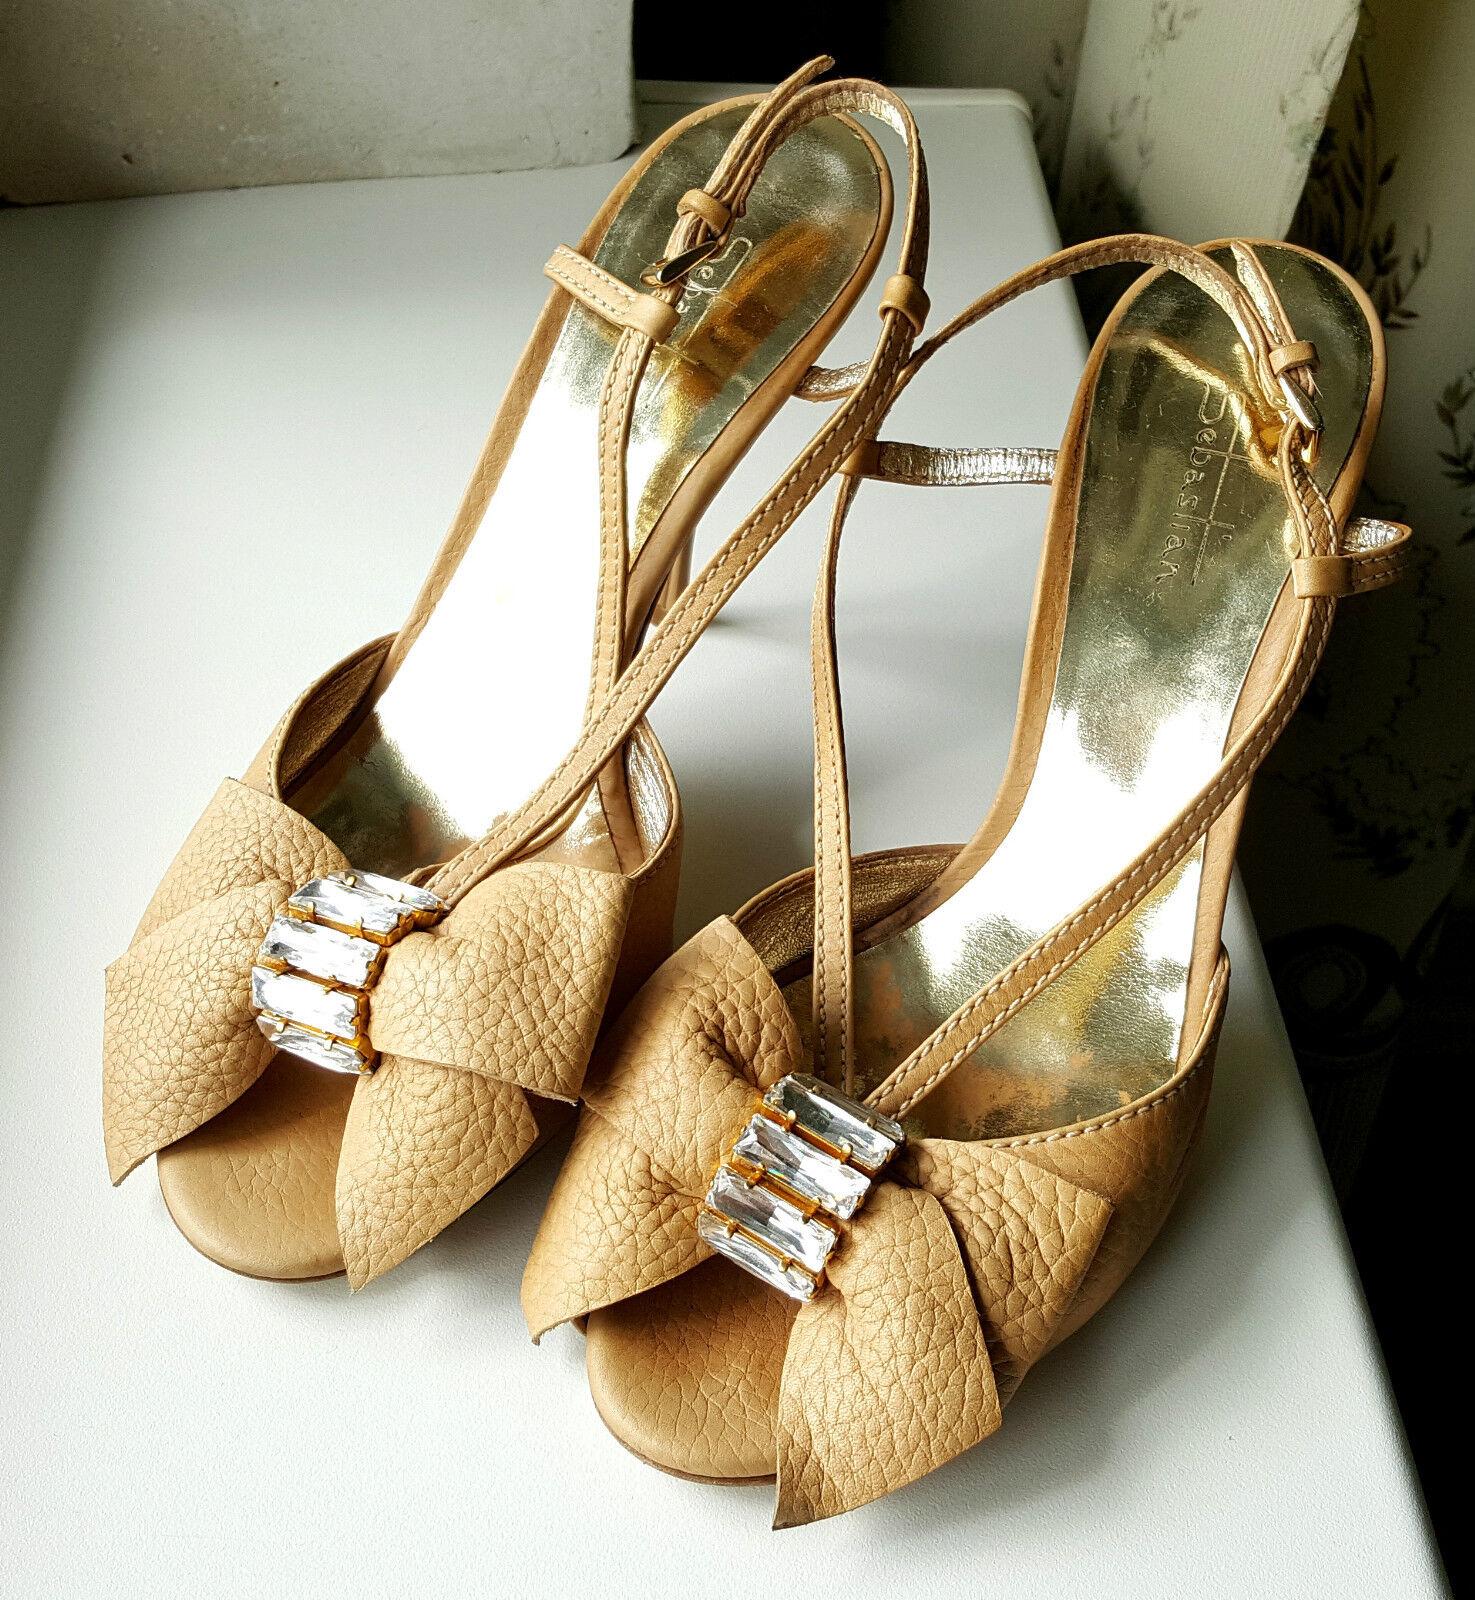 SEBASTIAN High Heel Leather Sandals gr. EUR 38